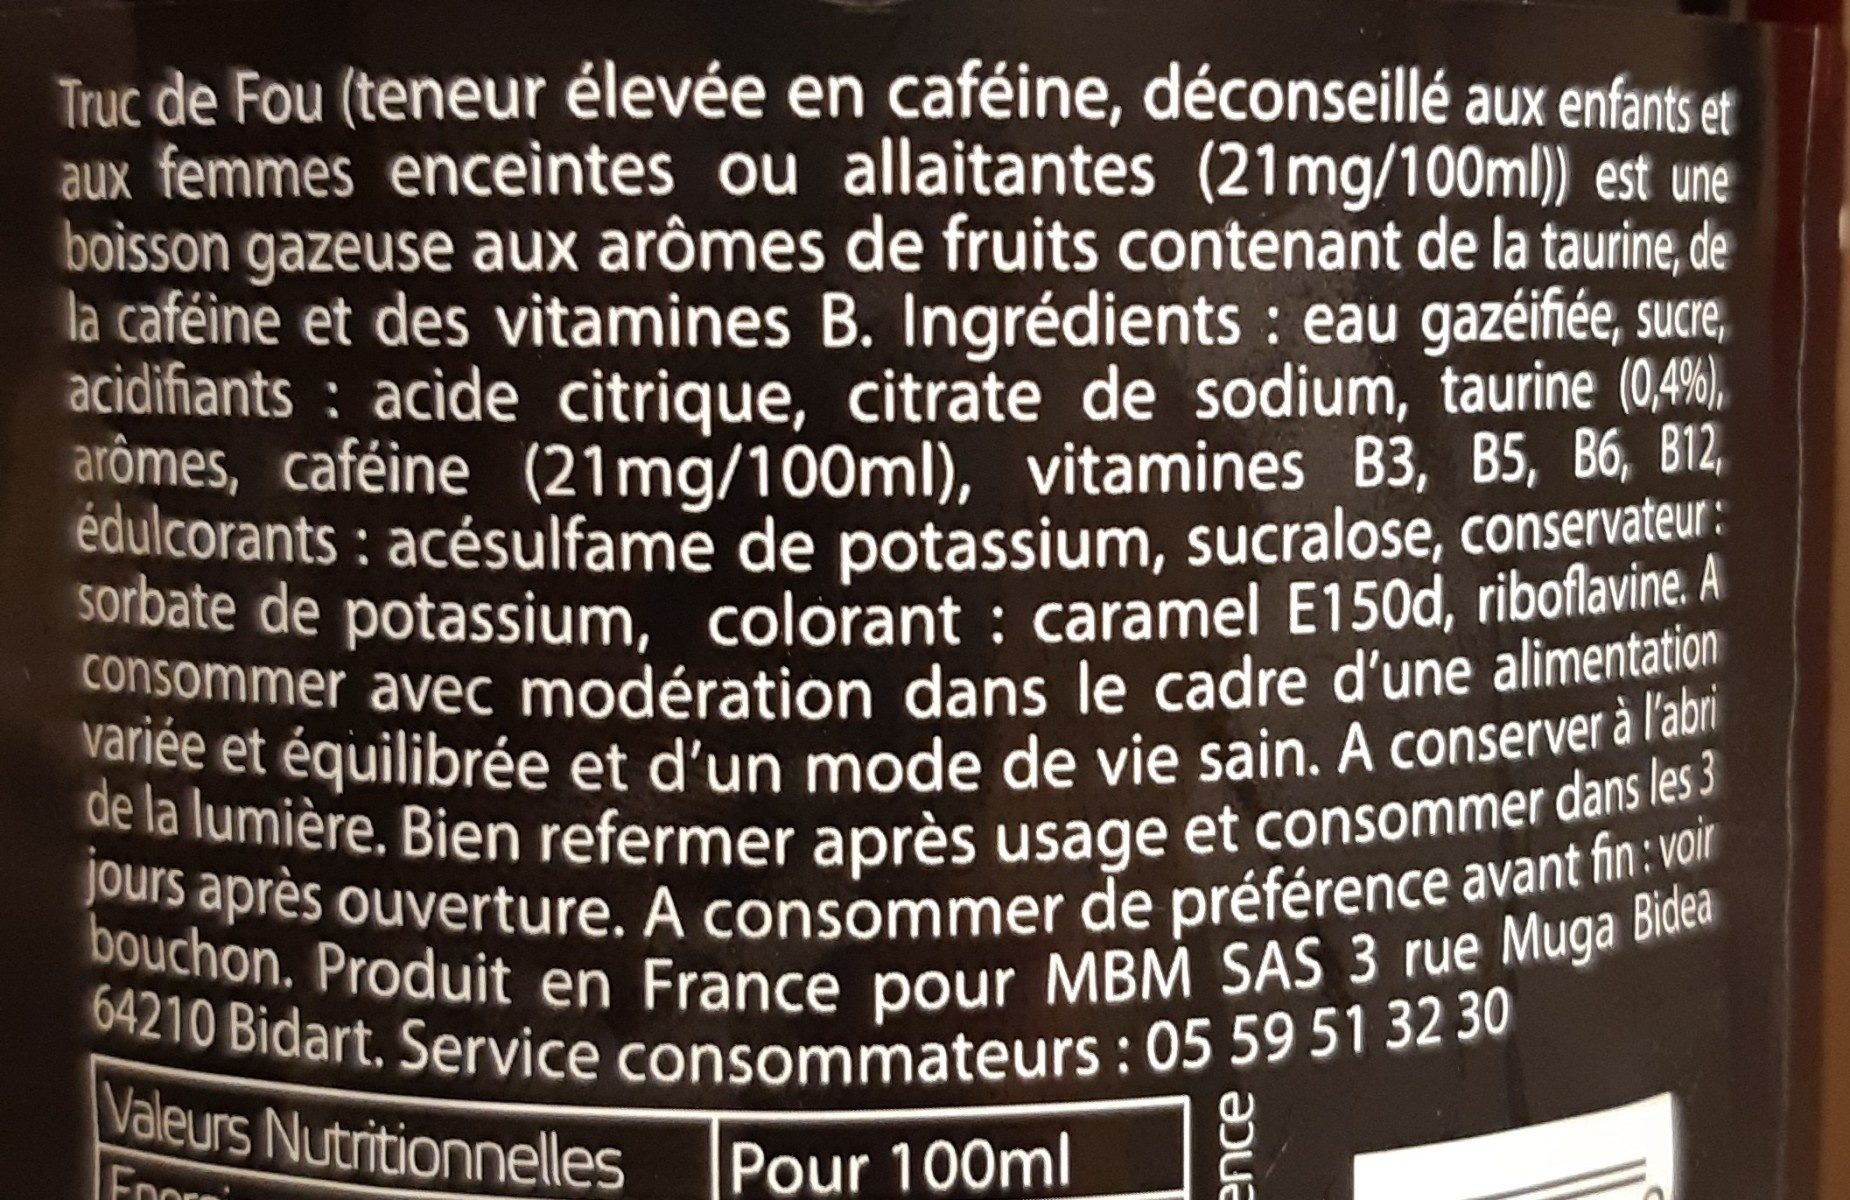 Truc de fou - Ingredients - fr